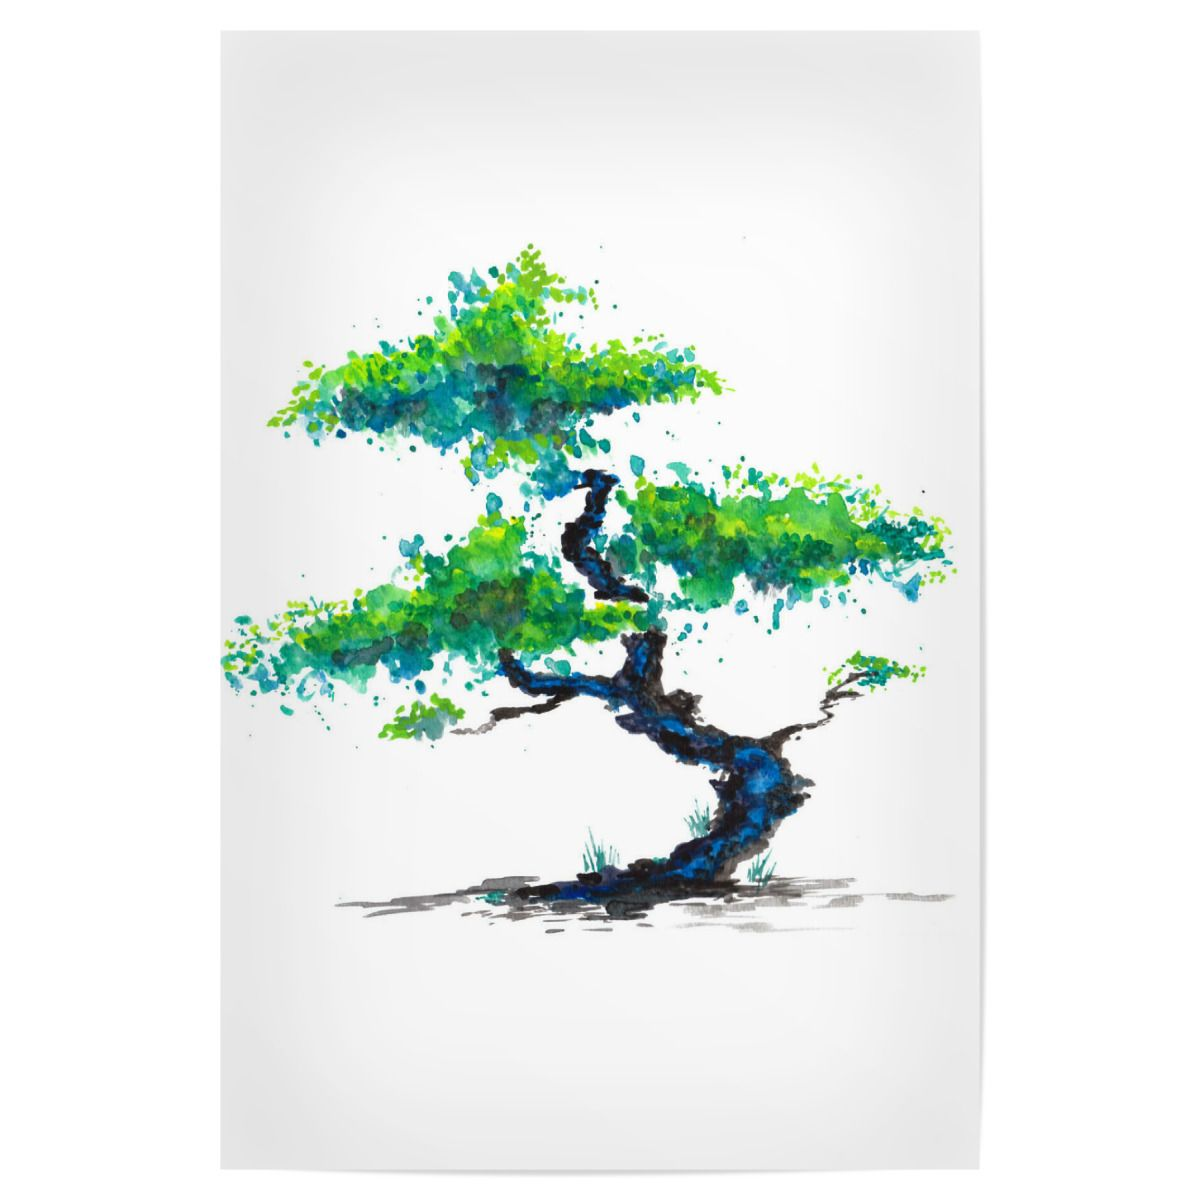 Blauer Bonsai Premium Poster - #ZeichenbloQ #artboxone #poster #artprints #homedecor #bonsai #japanese